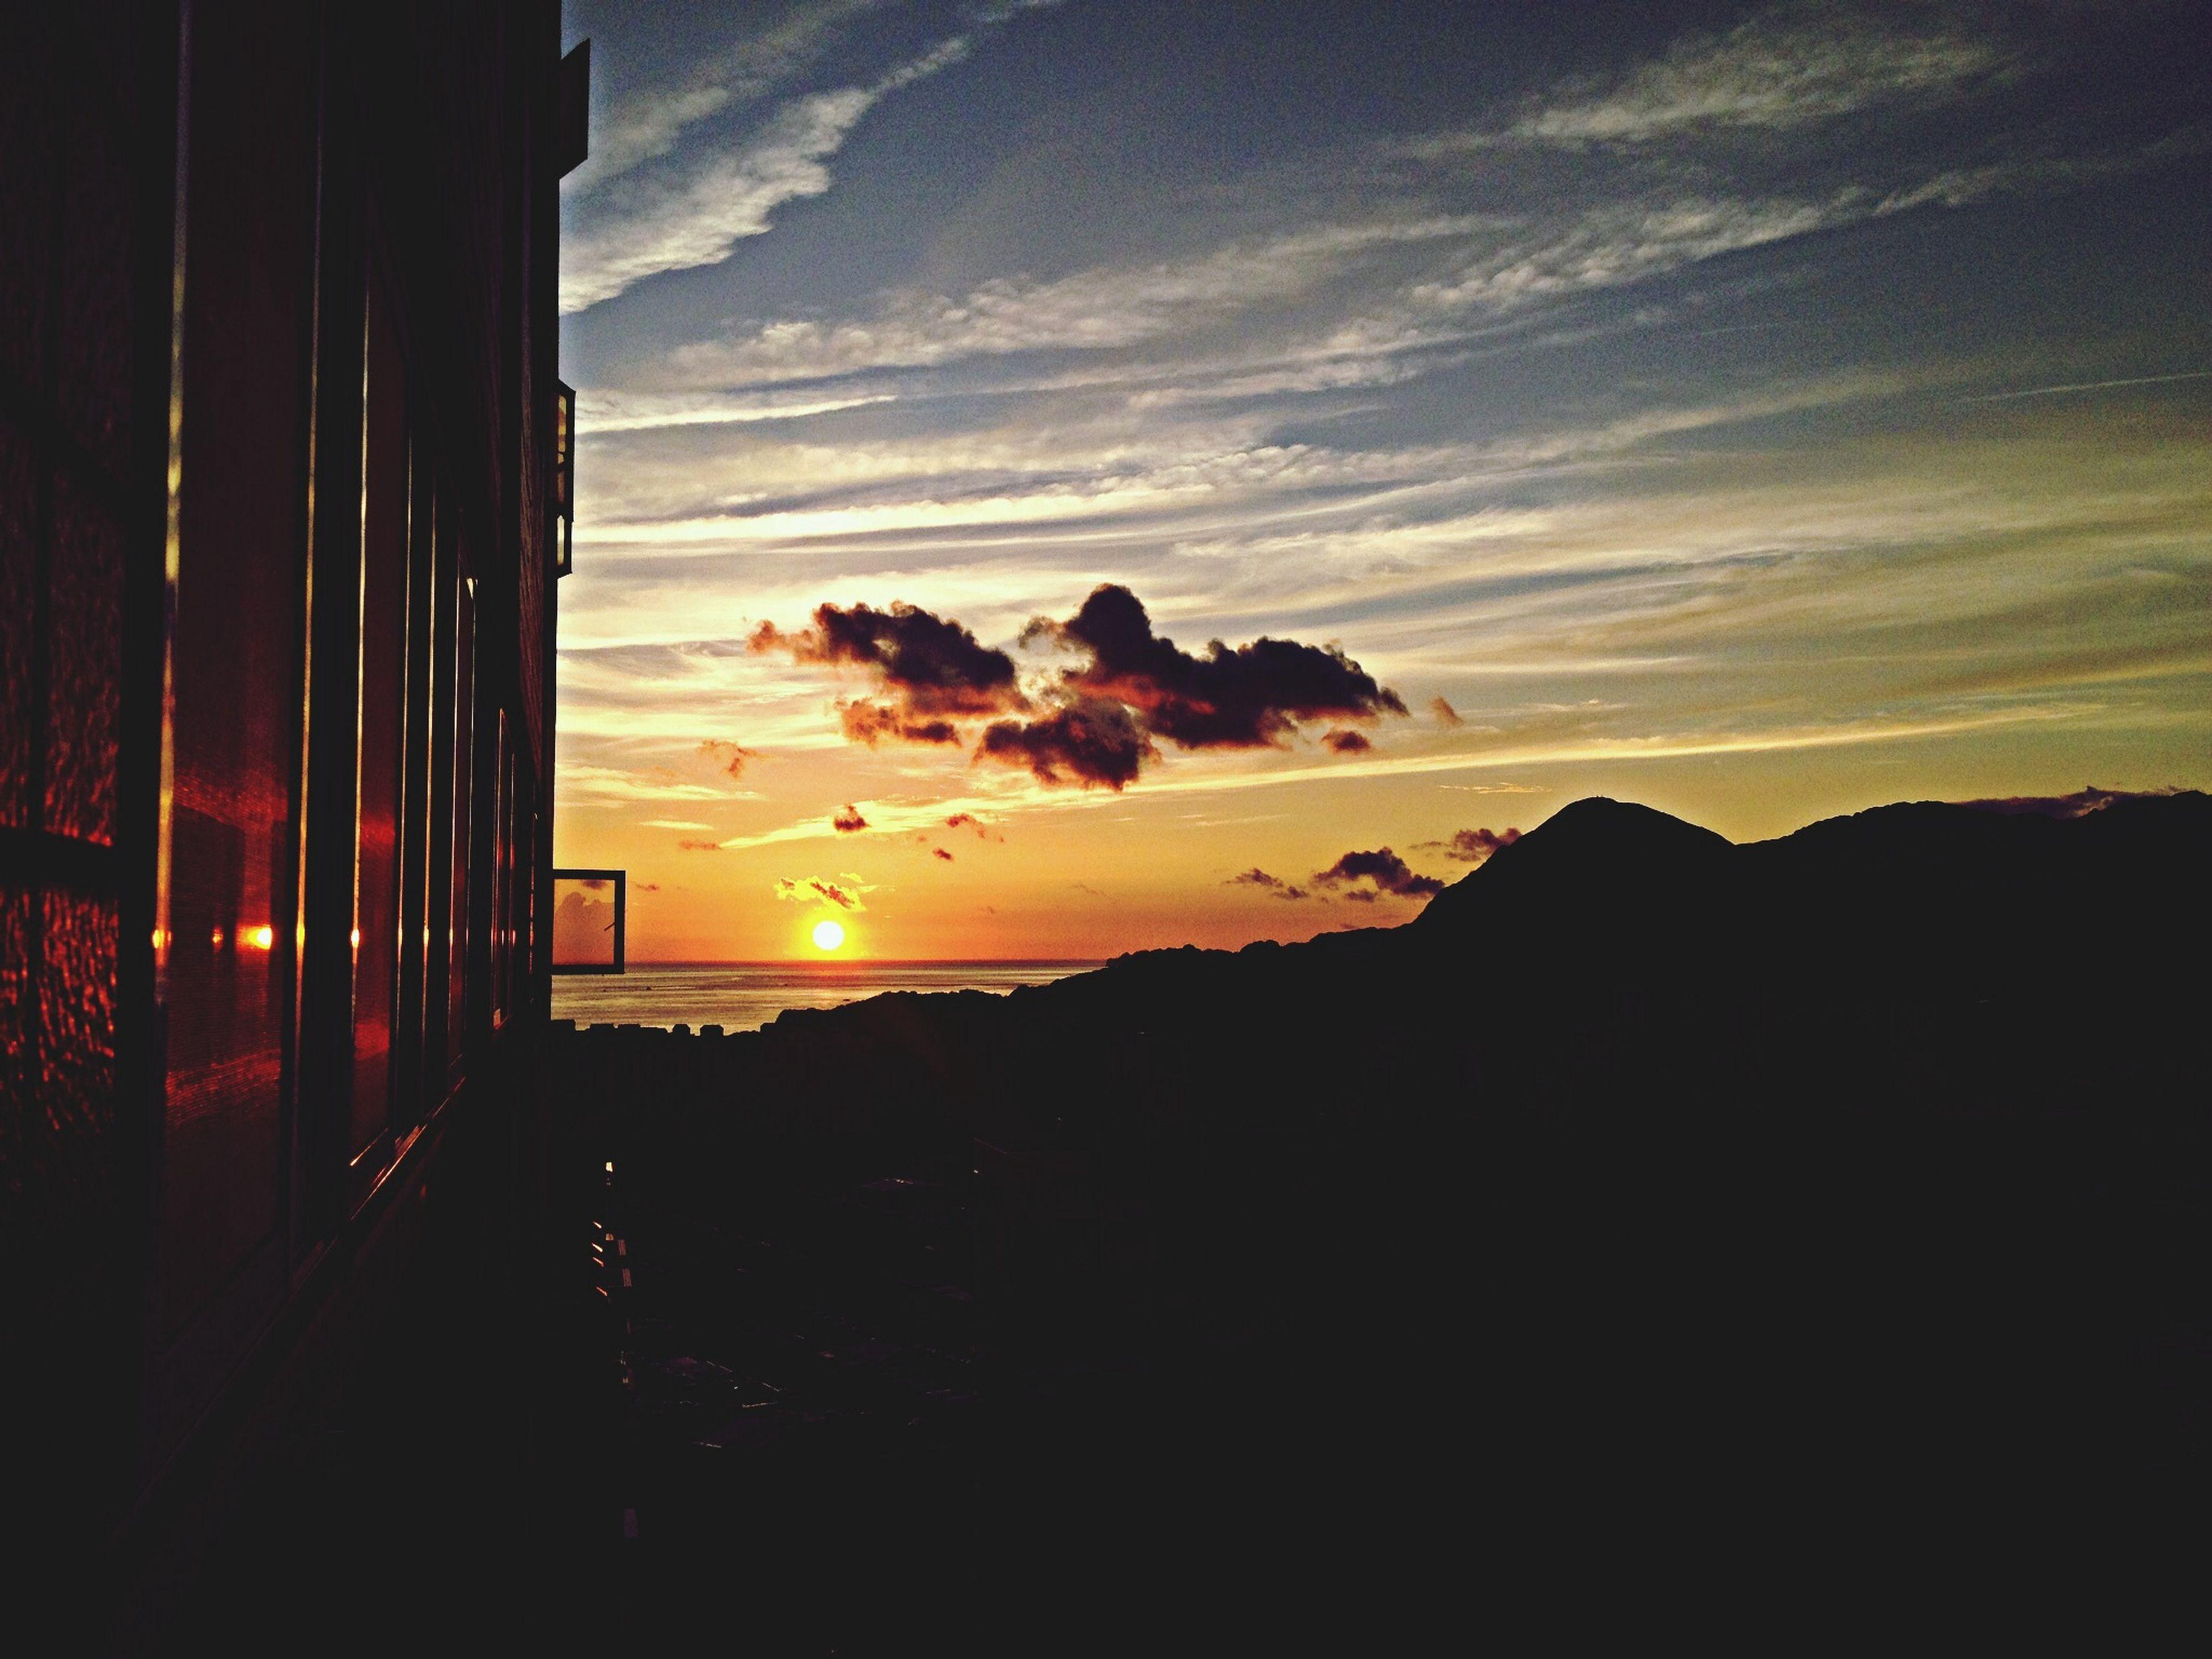 sunset, sky, silhouette, scenics, sun, tranquil scene, orange color, beauty in nature, sea, tranquility, idyllic, nature, cloud - sky, beach, horizon over water, mountain, sunlight, cloud, dark, water